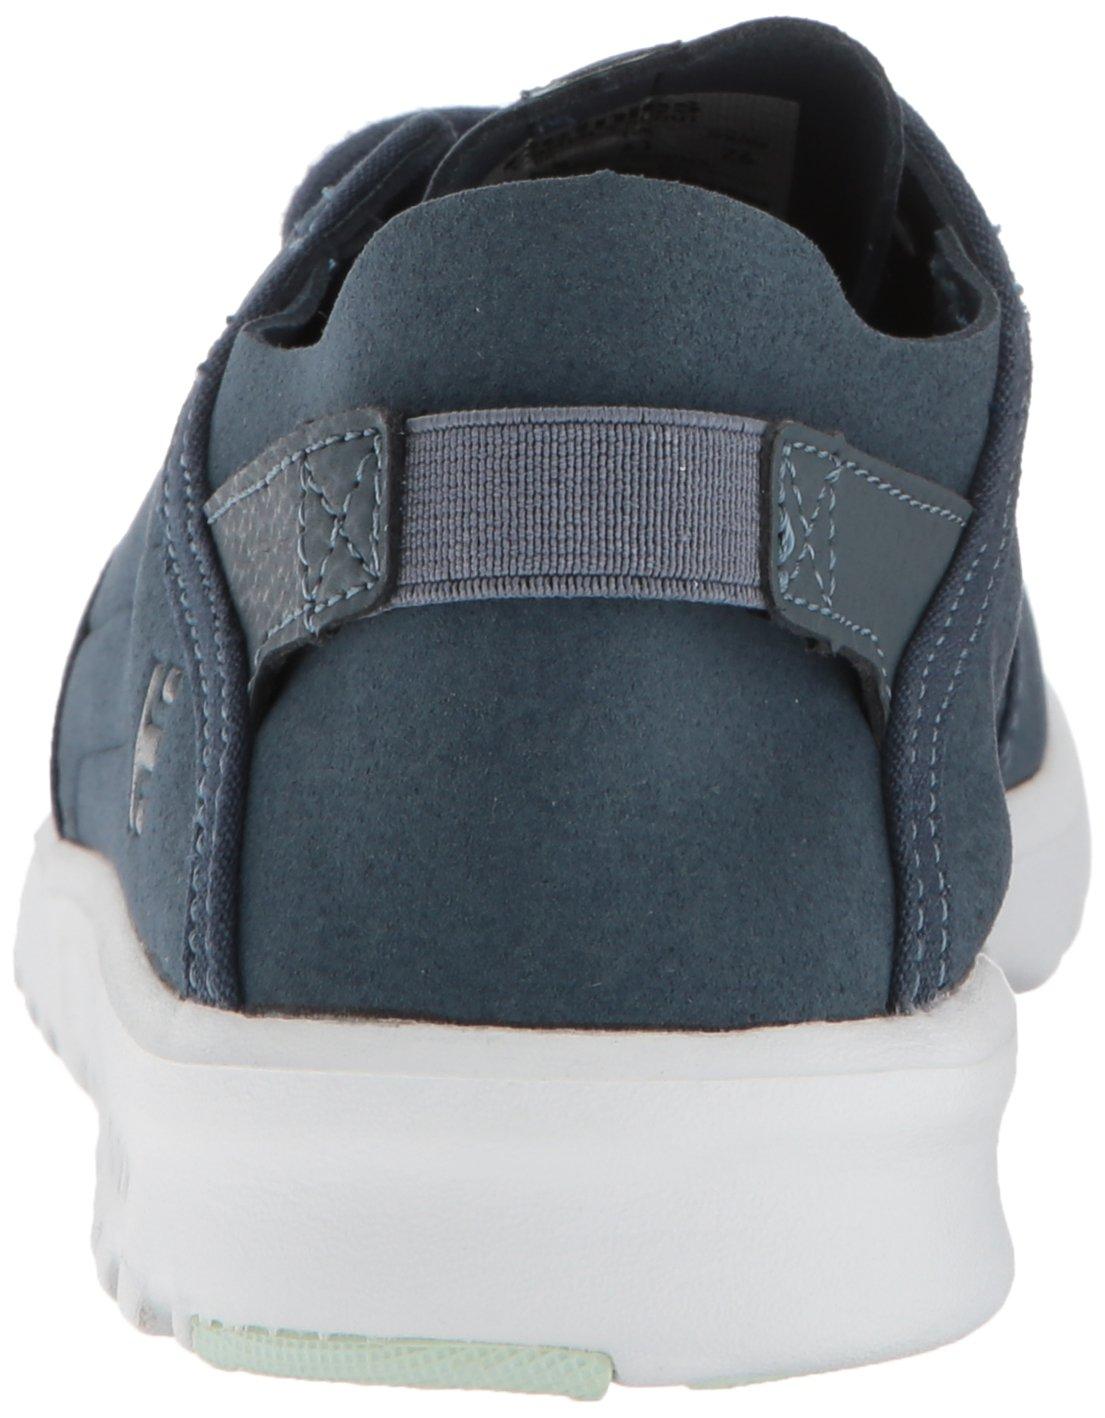 Etnies Sneaker Womens Scout Sneaker Etnies B01N6XLNTO 7 B(M) US|Slate 992928